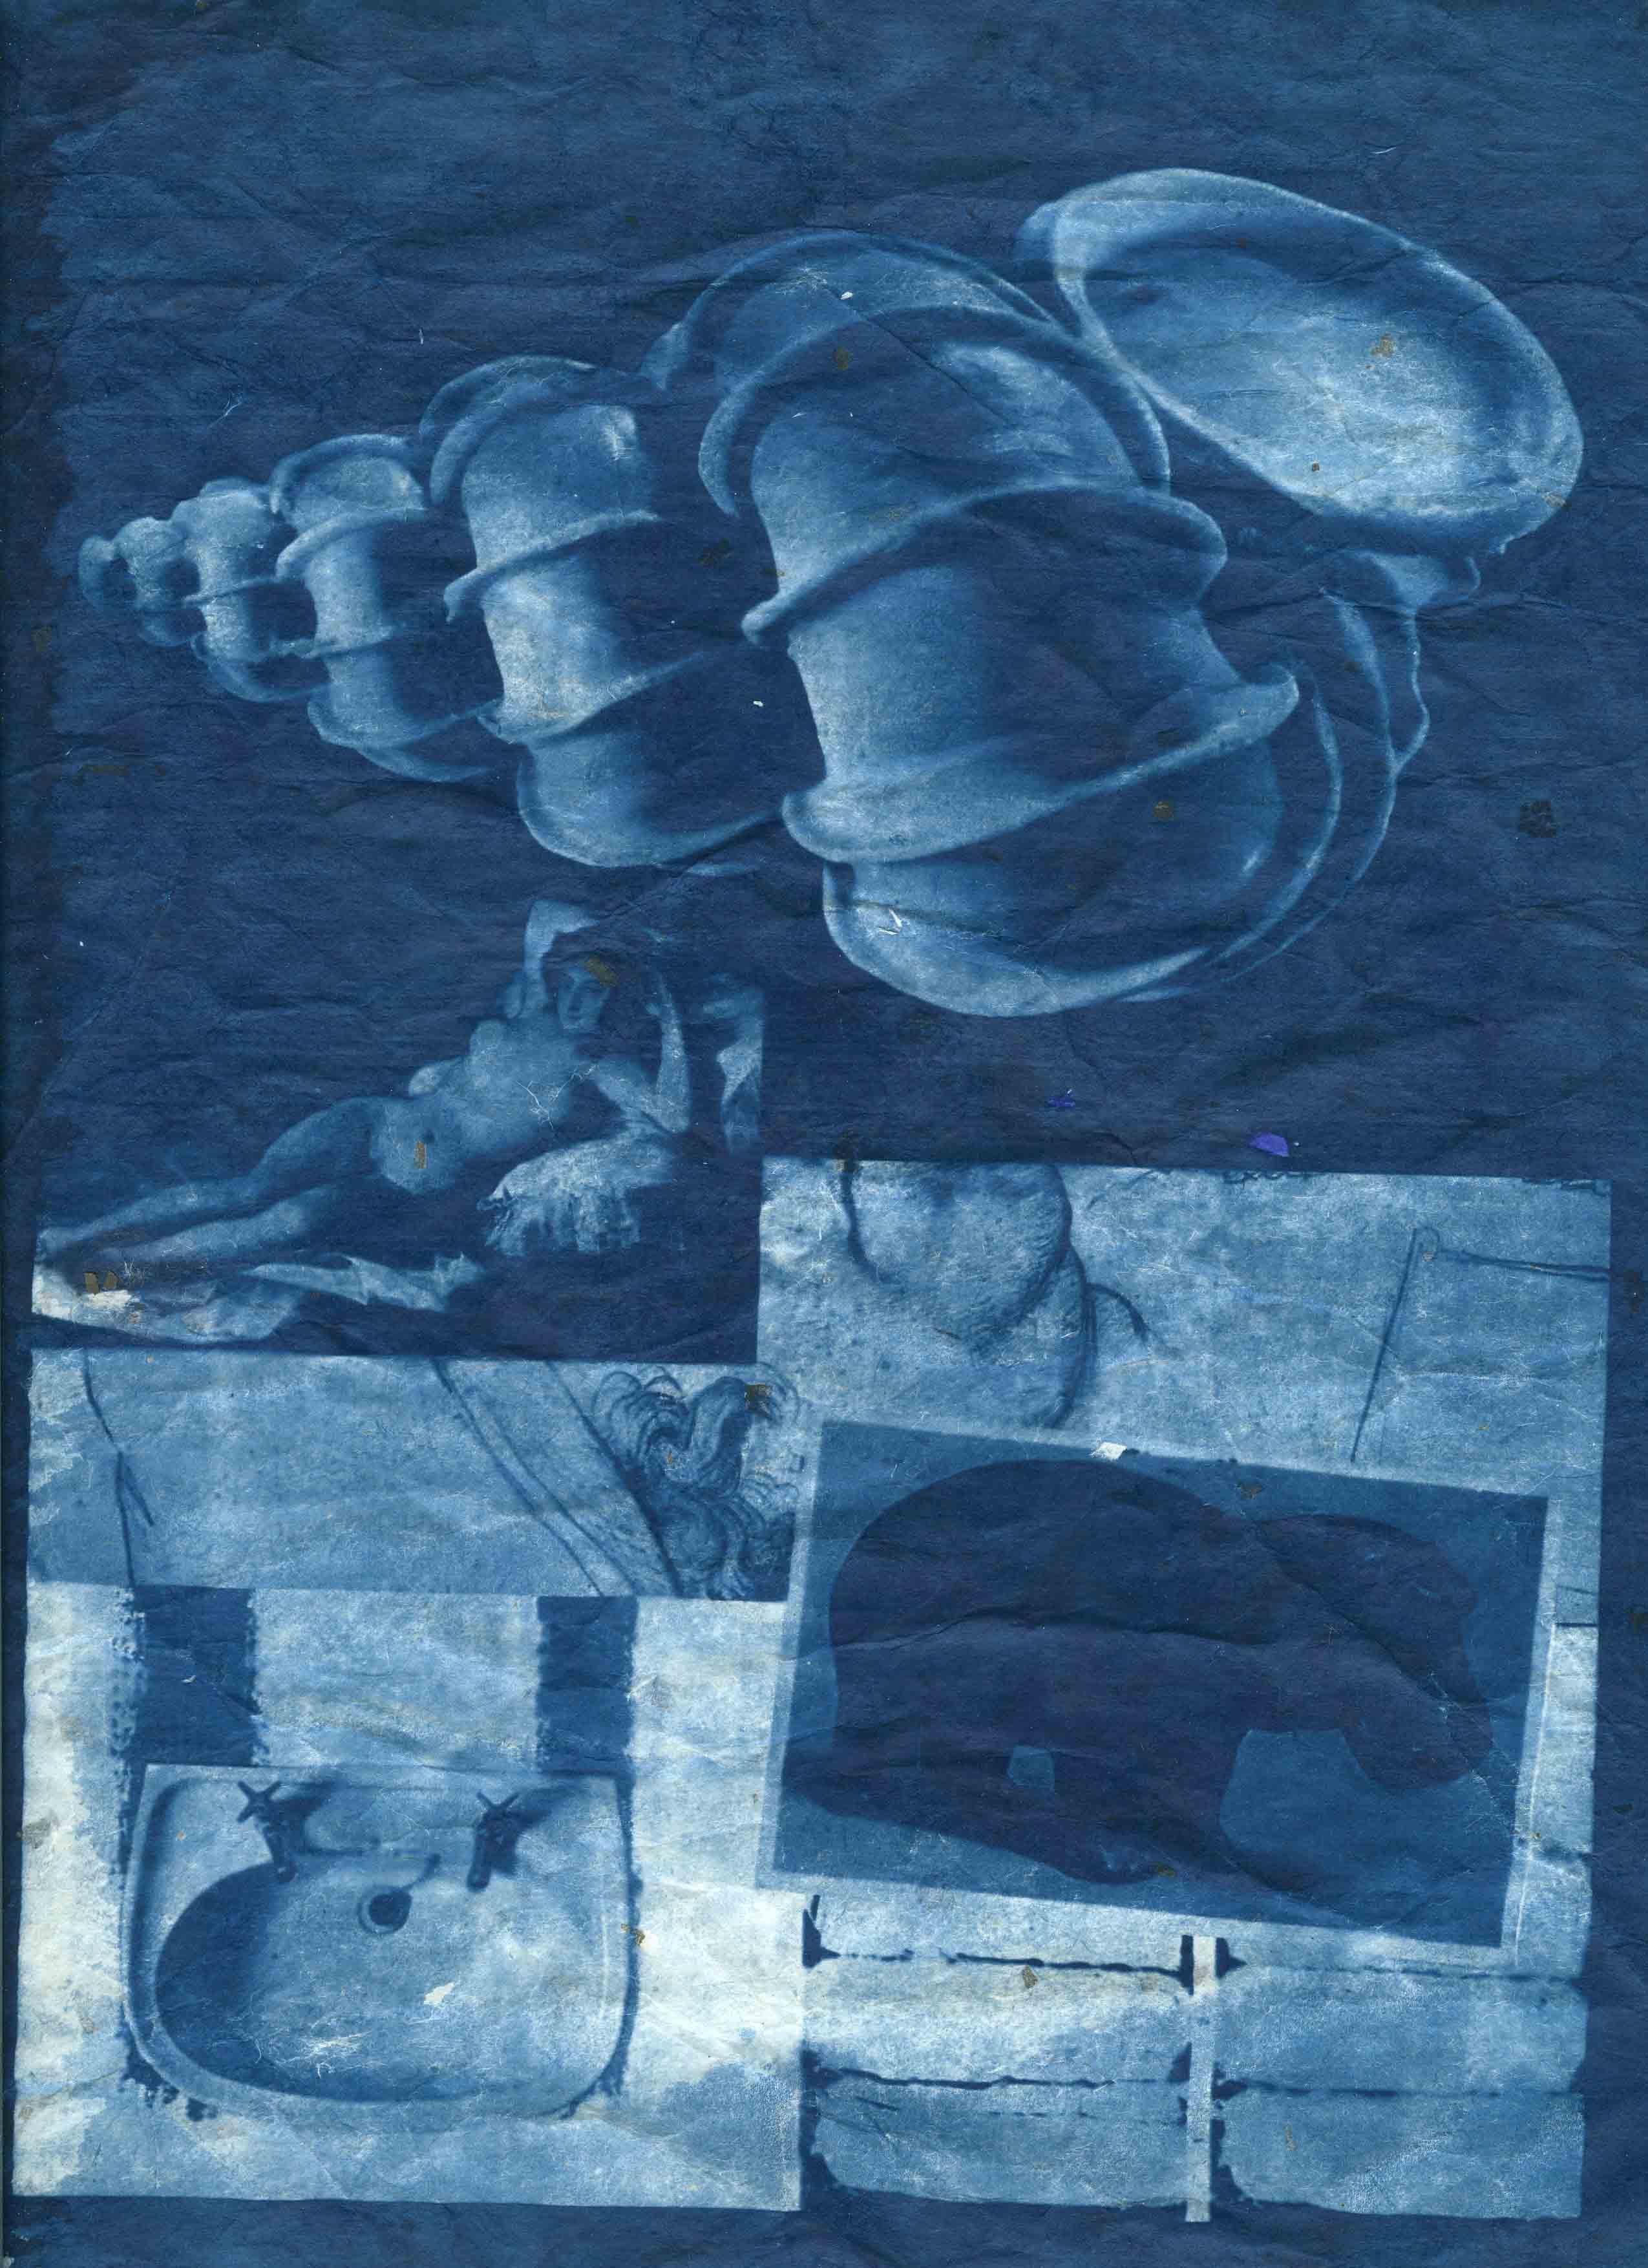 blue print  10.4.08 002.jpg